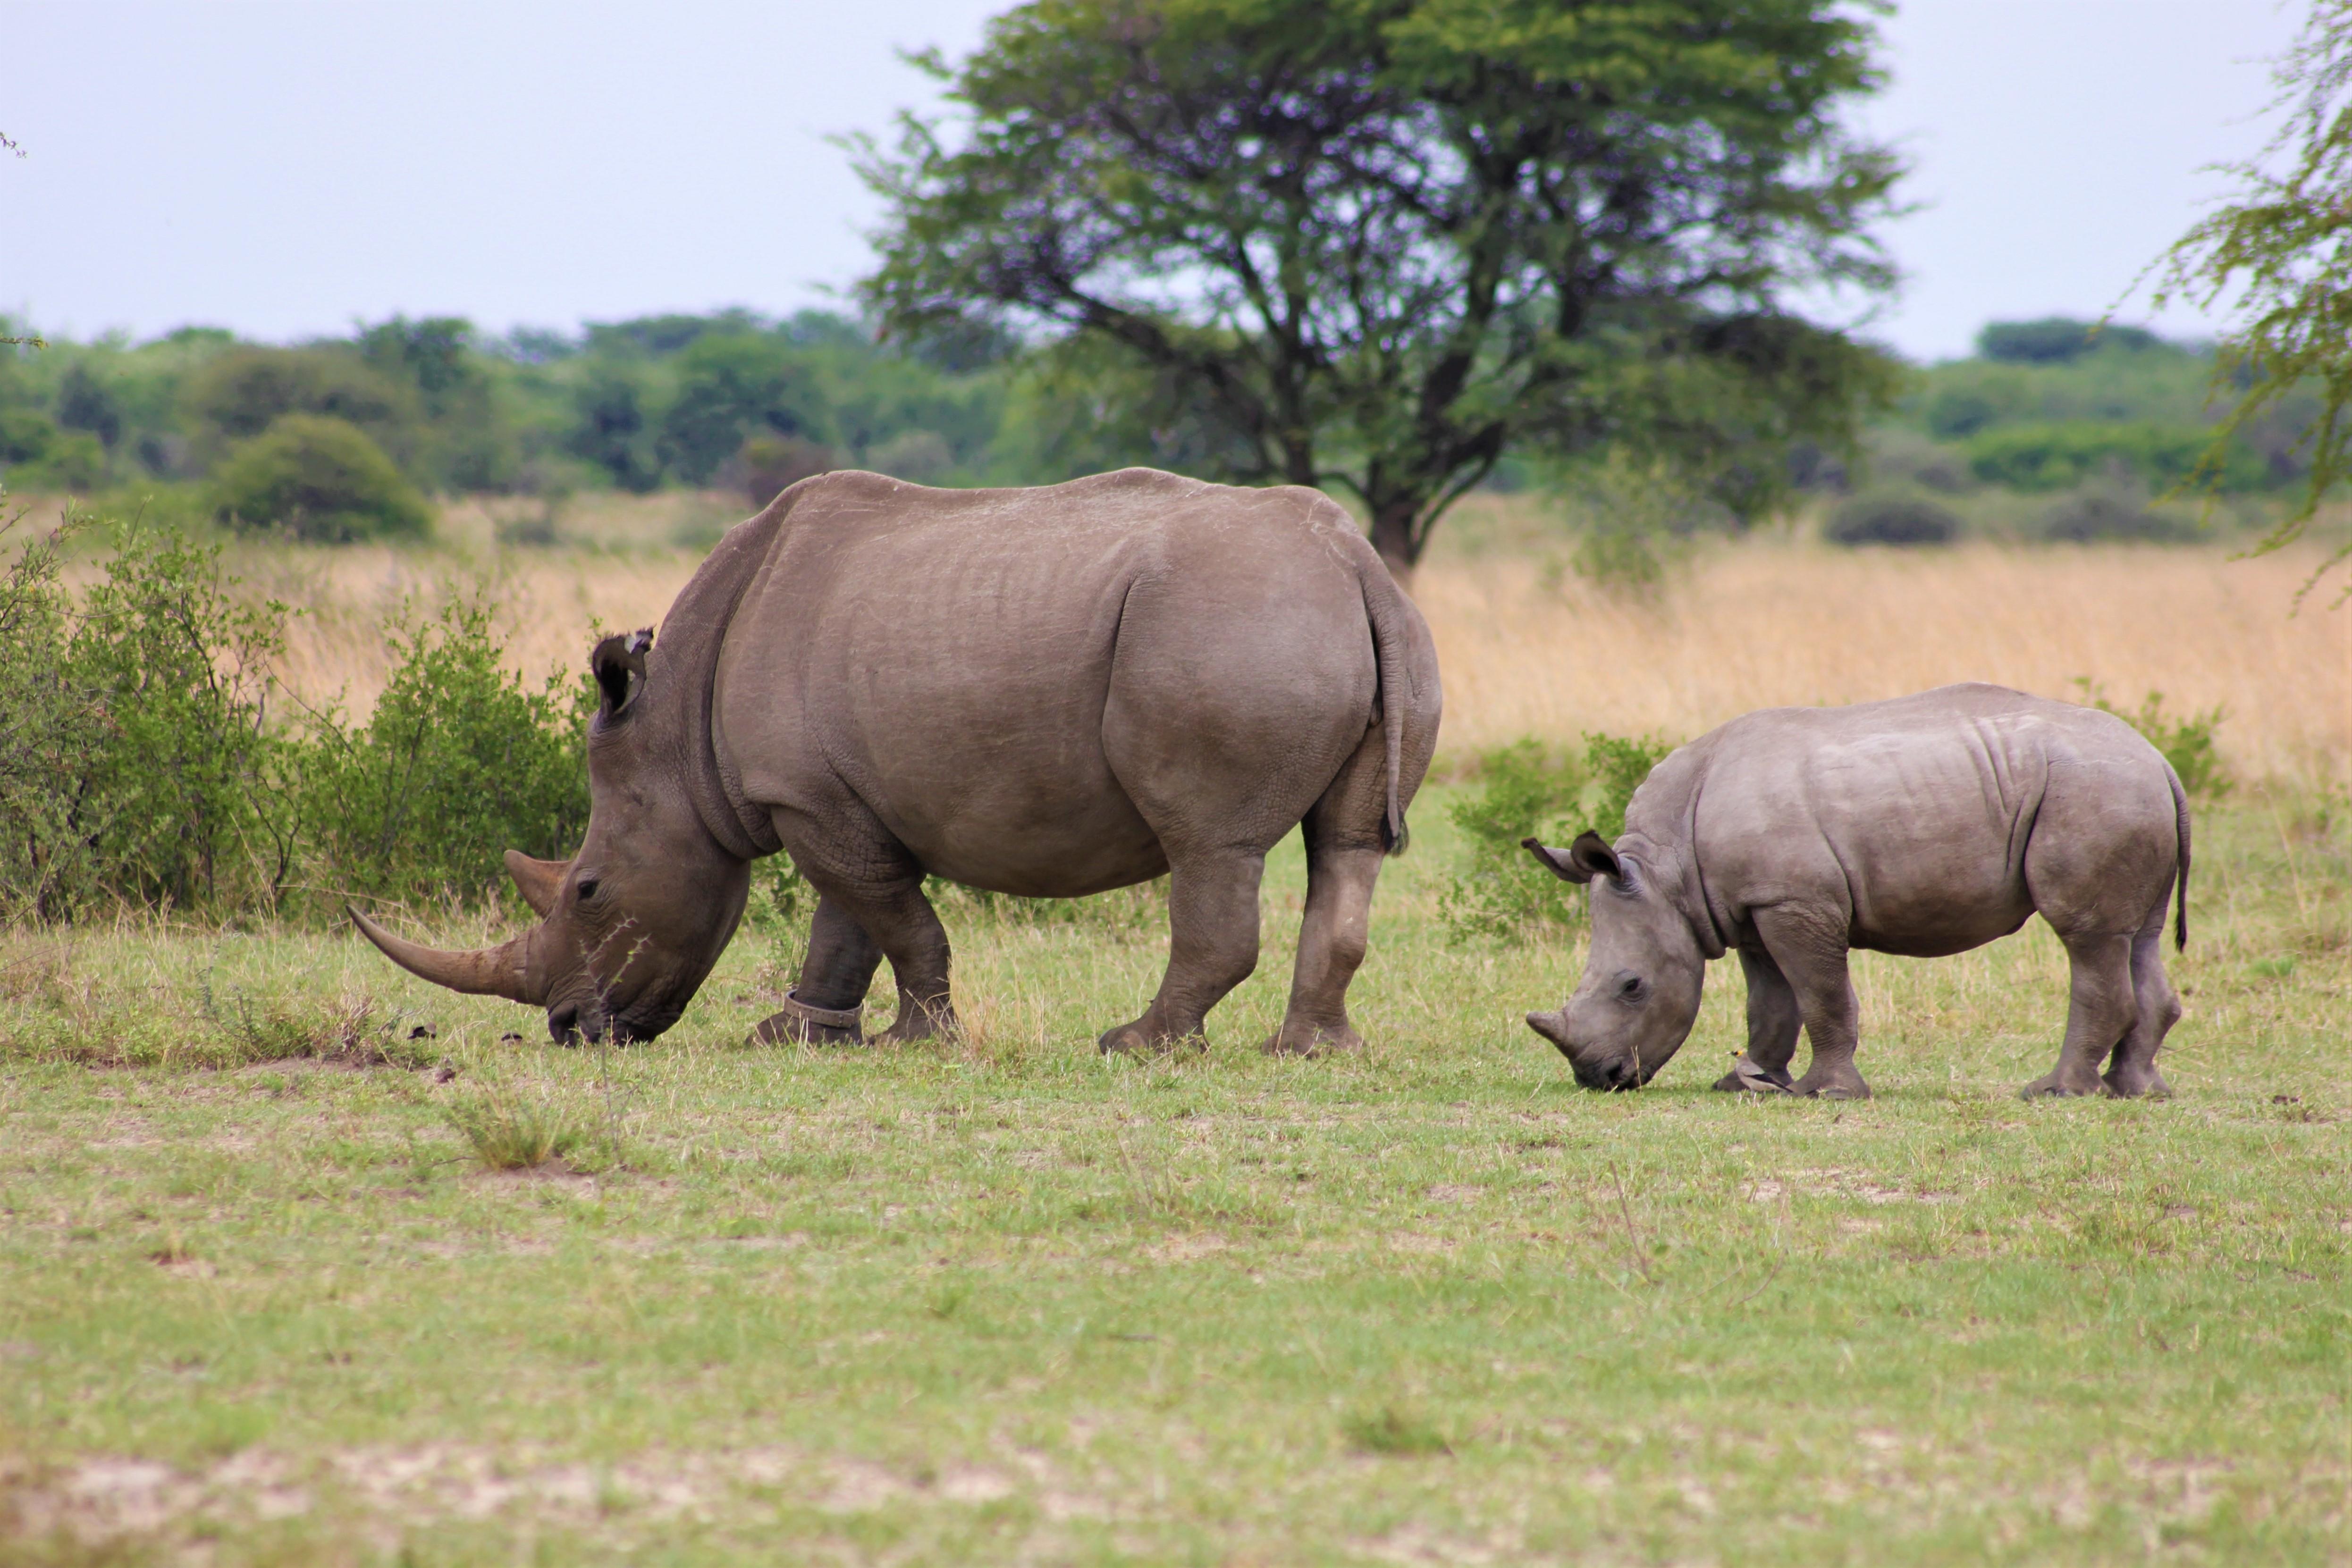 Two Rhinoceroses Grazing On Grass Field Free Stock Photo